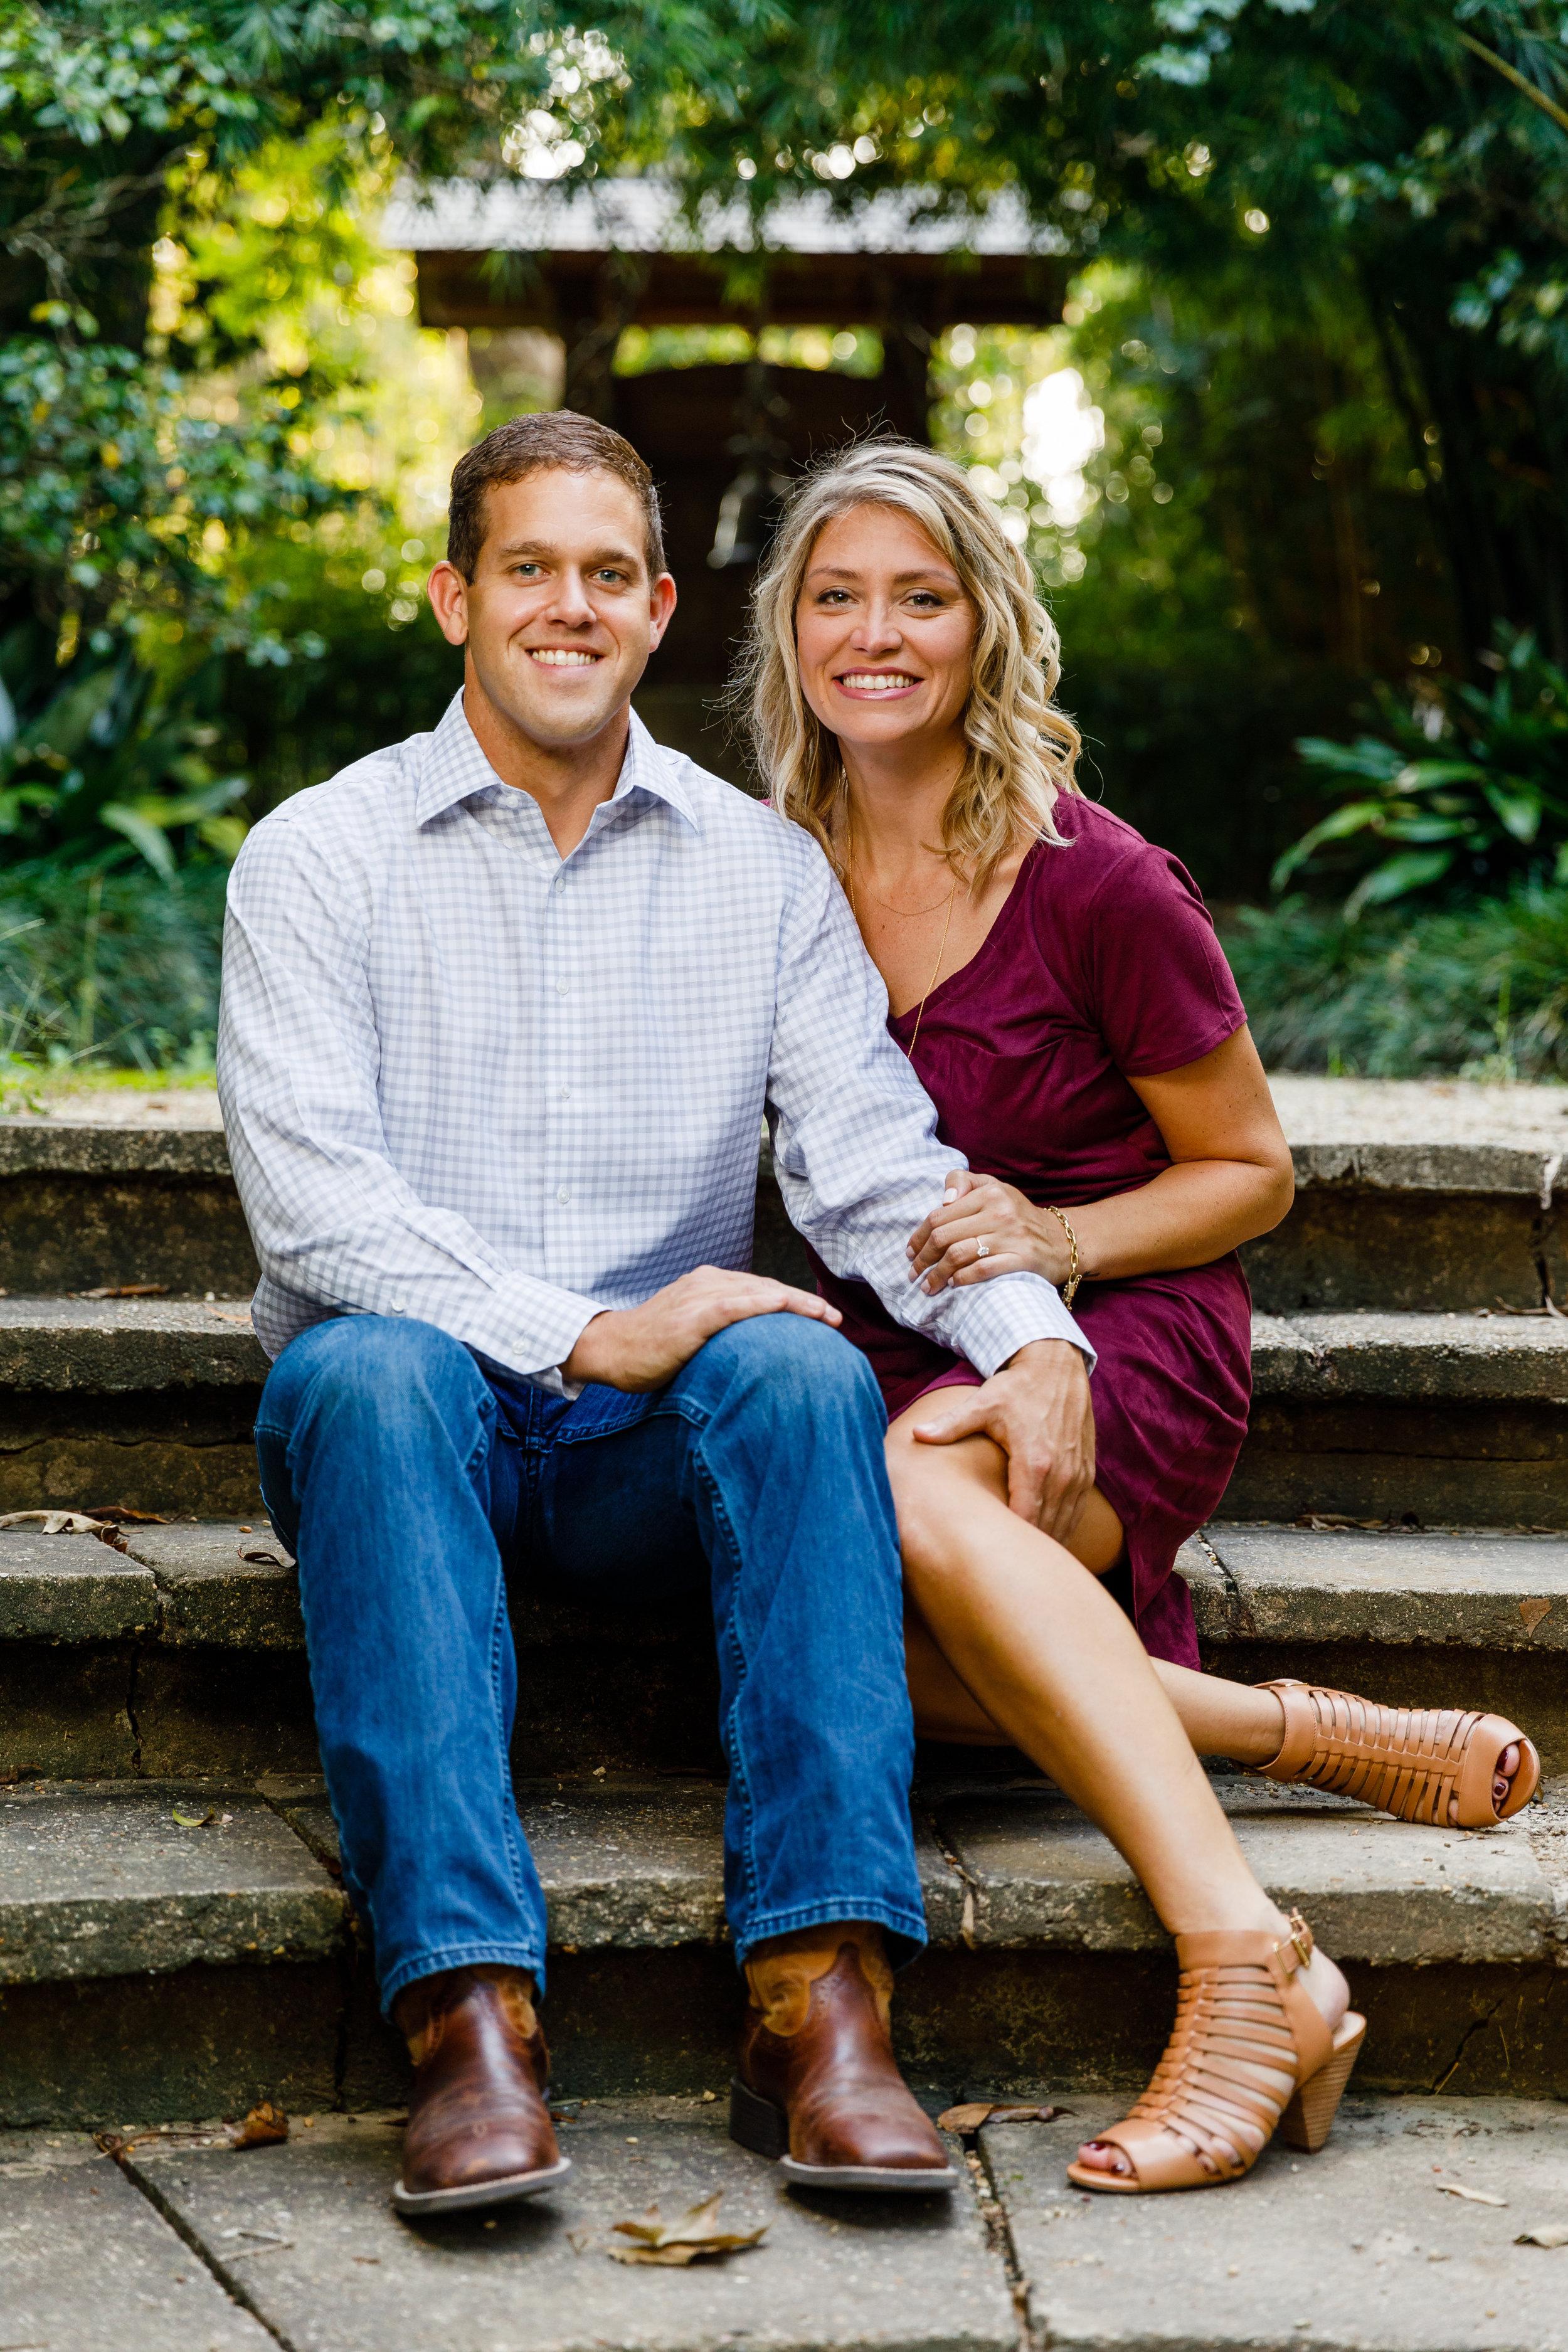 Youngsville-lafayette-portrait-family-wedding-photographer-8946.jpg